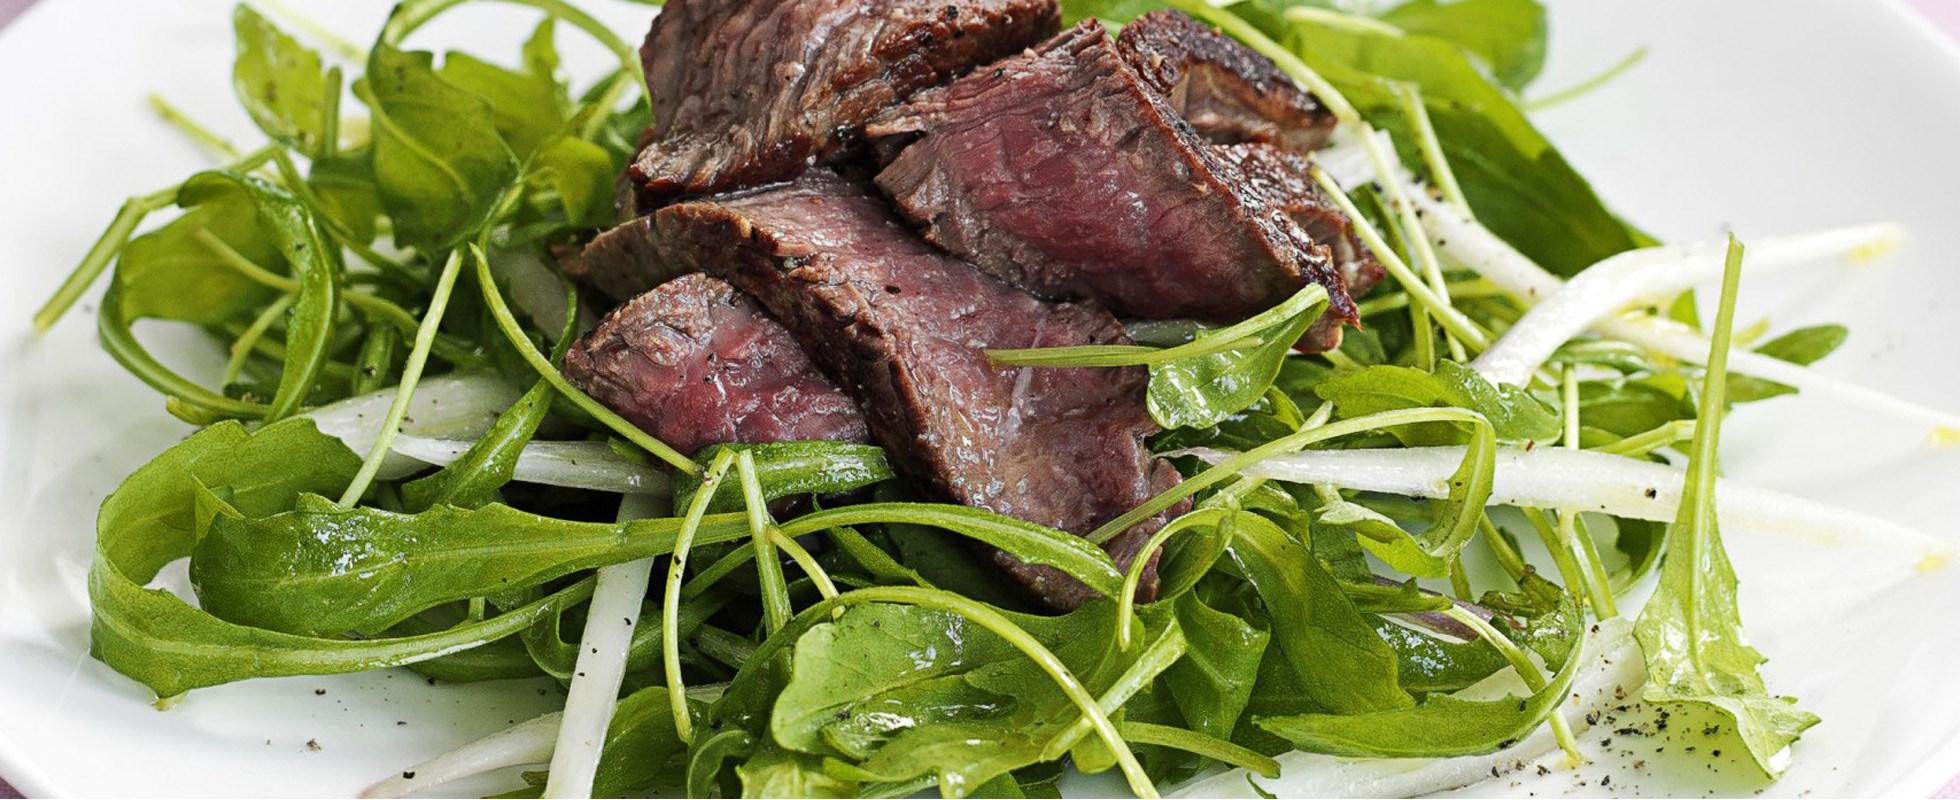 Rocket, seared beef and shallot salad